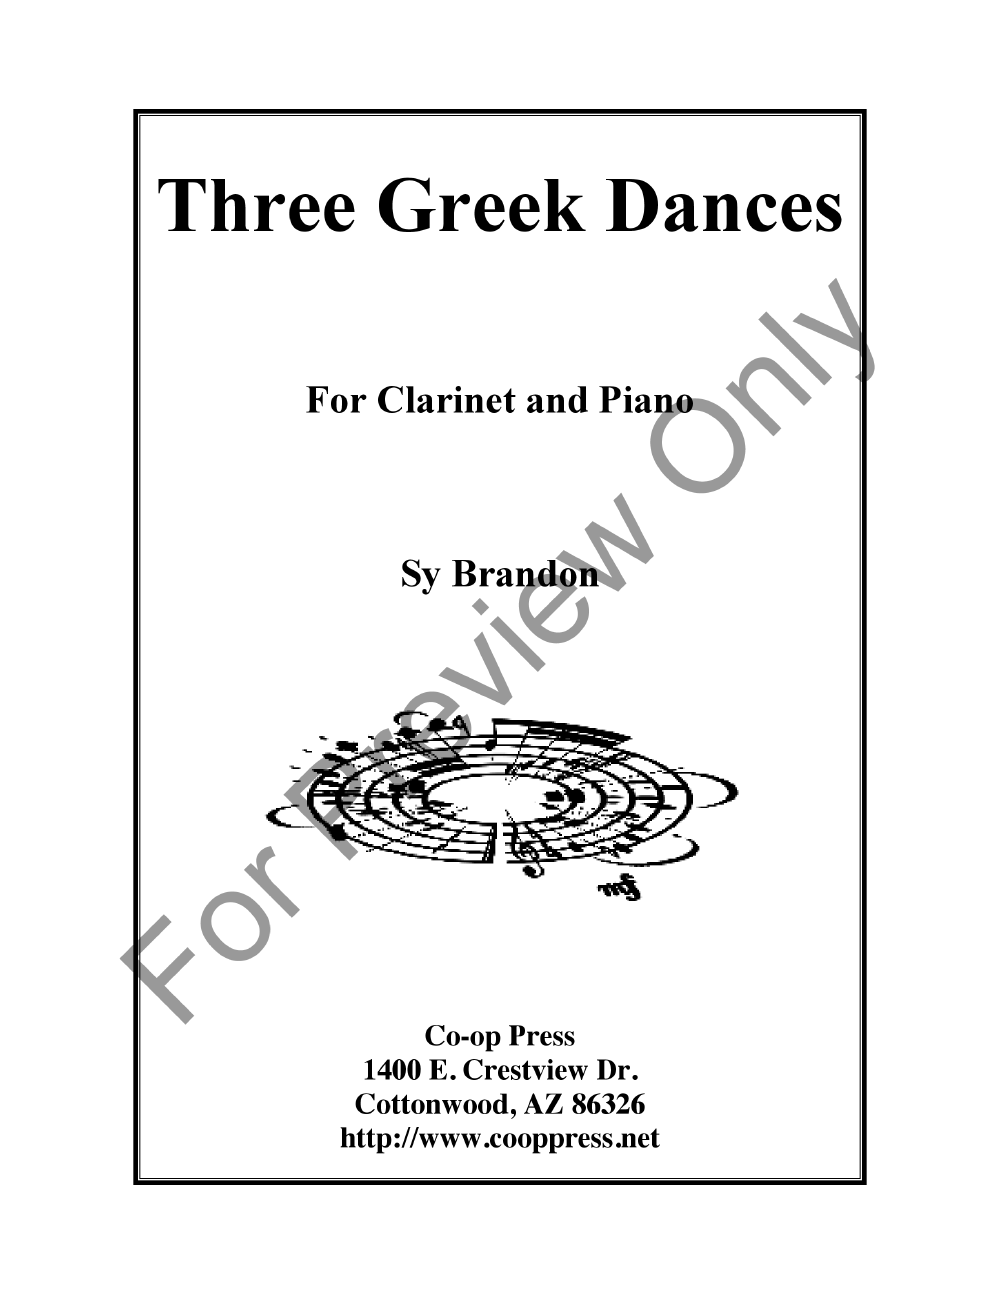 Three Greek Dances Thumbnail